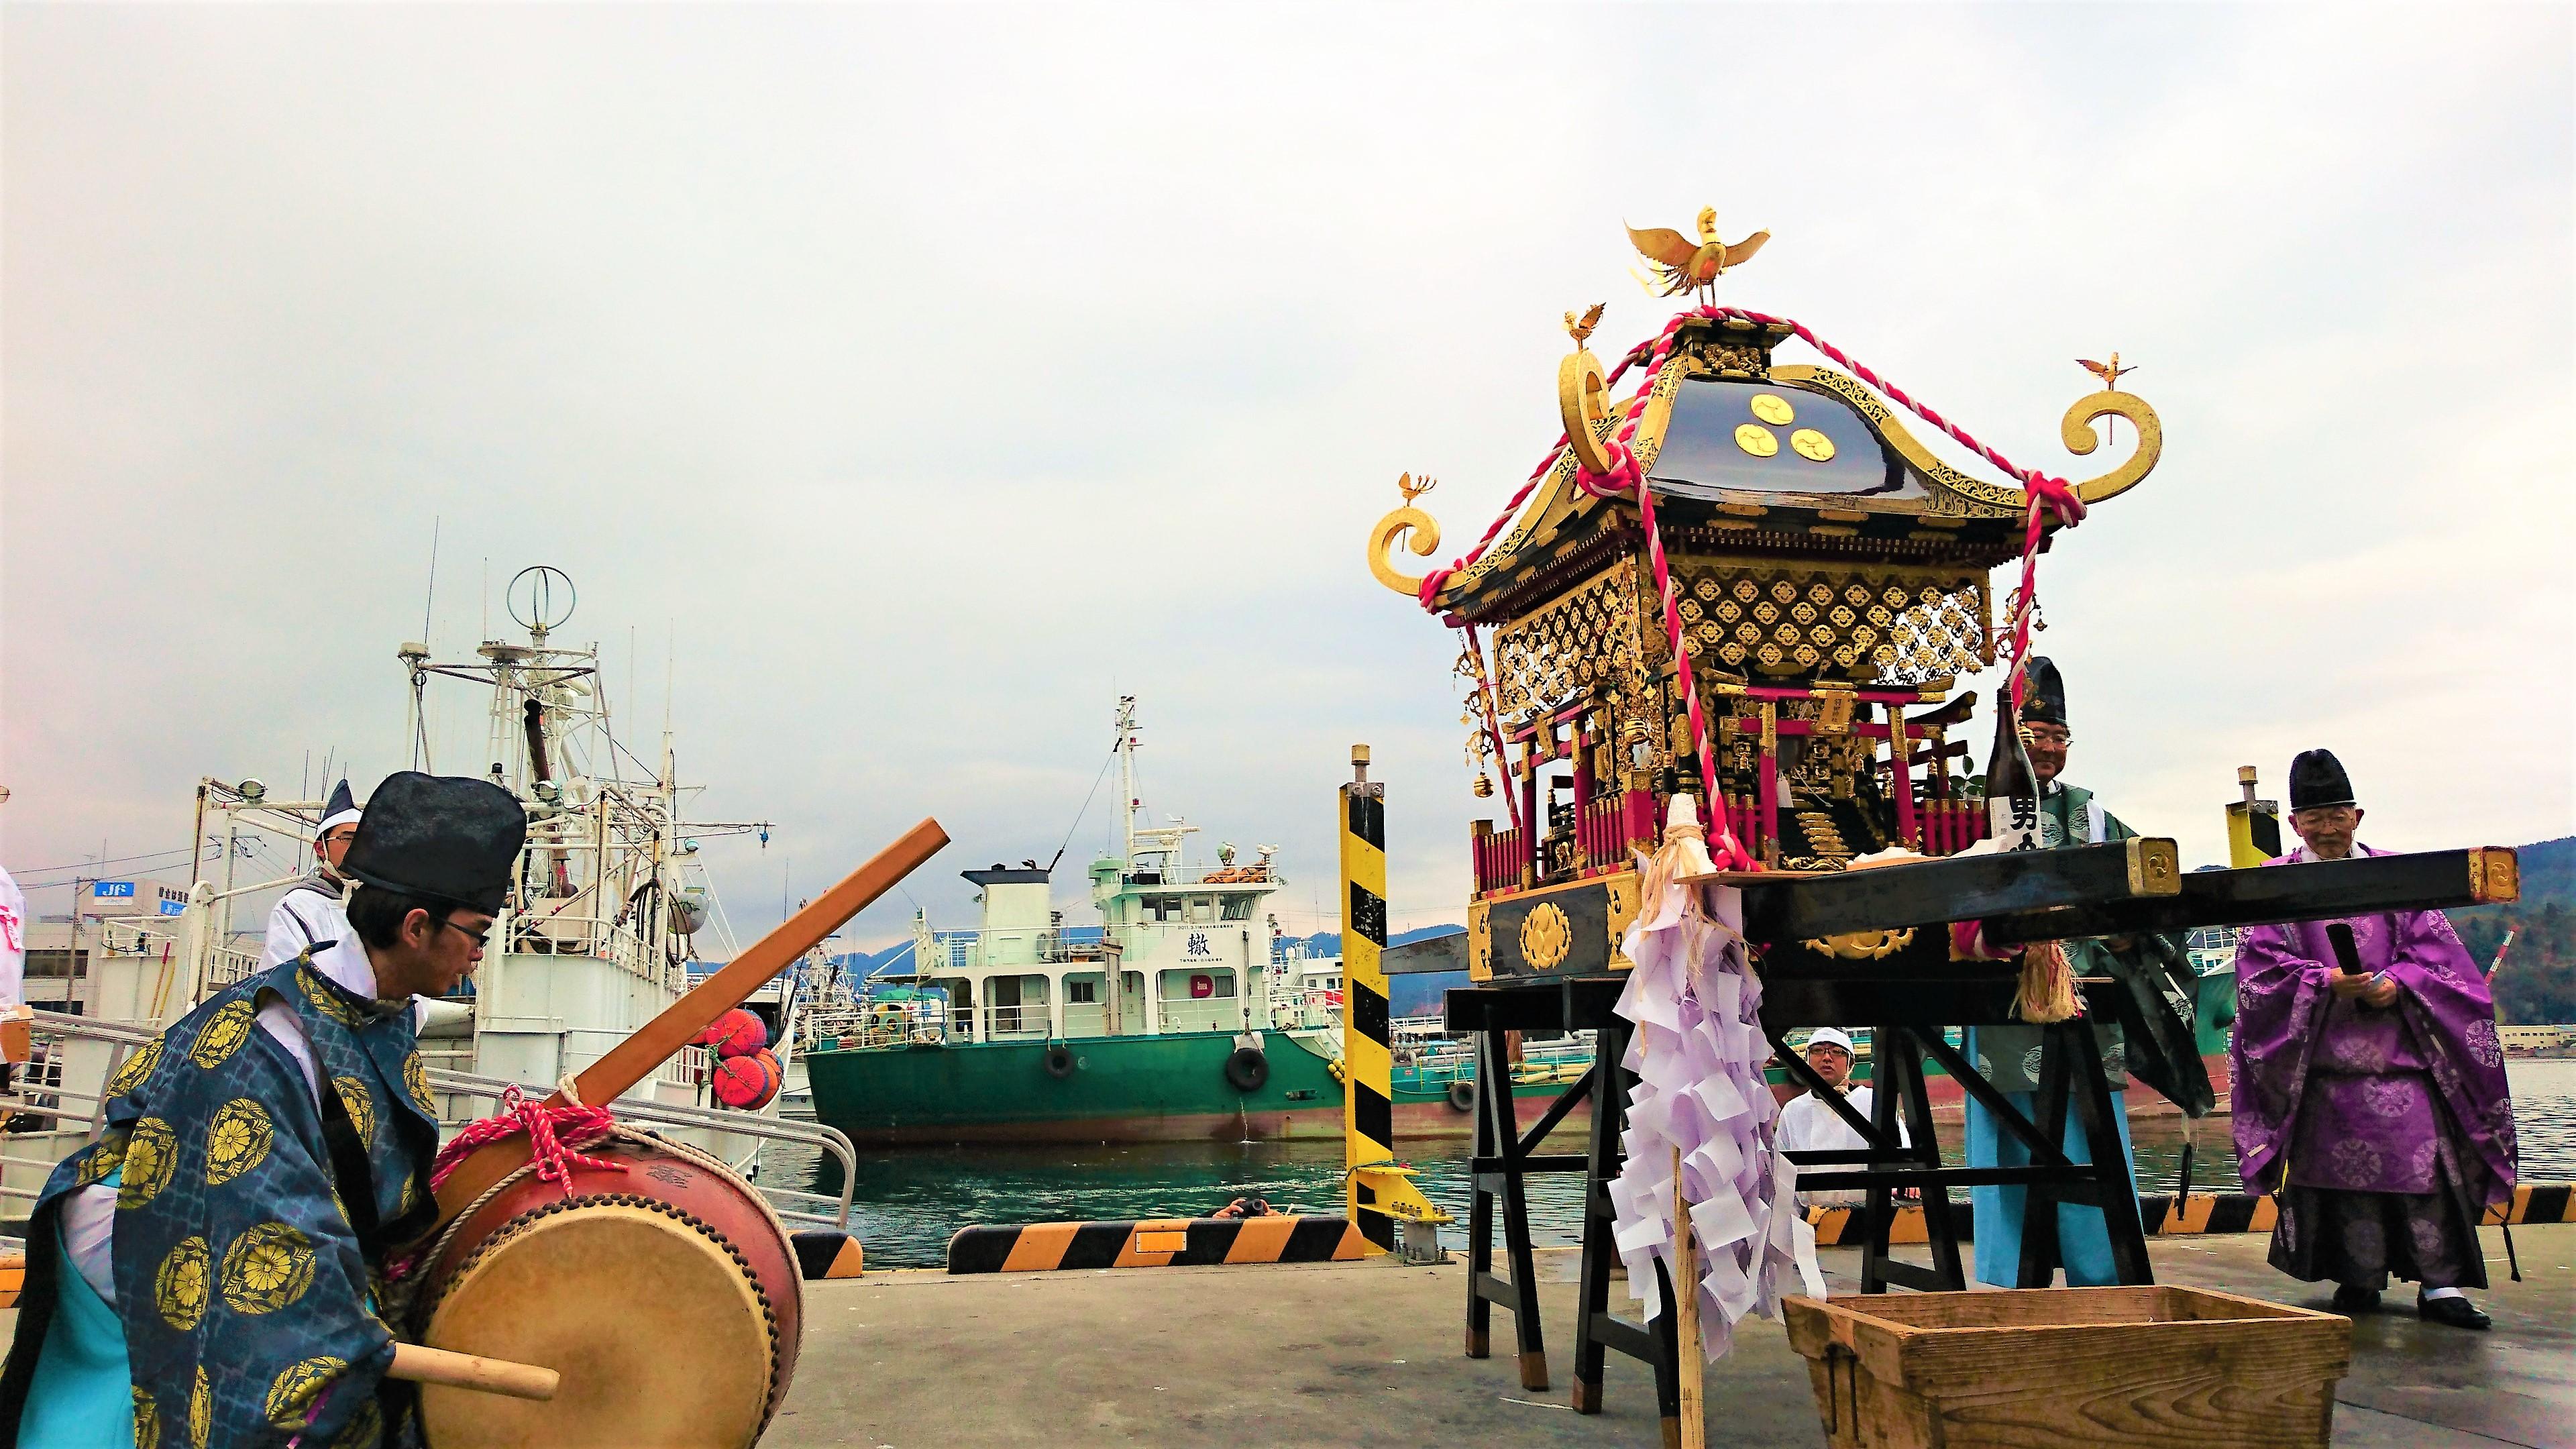 Picture of the portable shrine at the kesennuma port